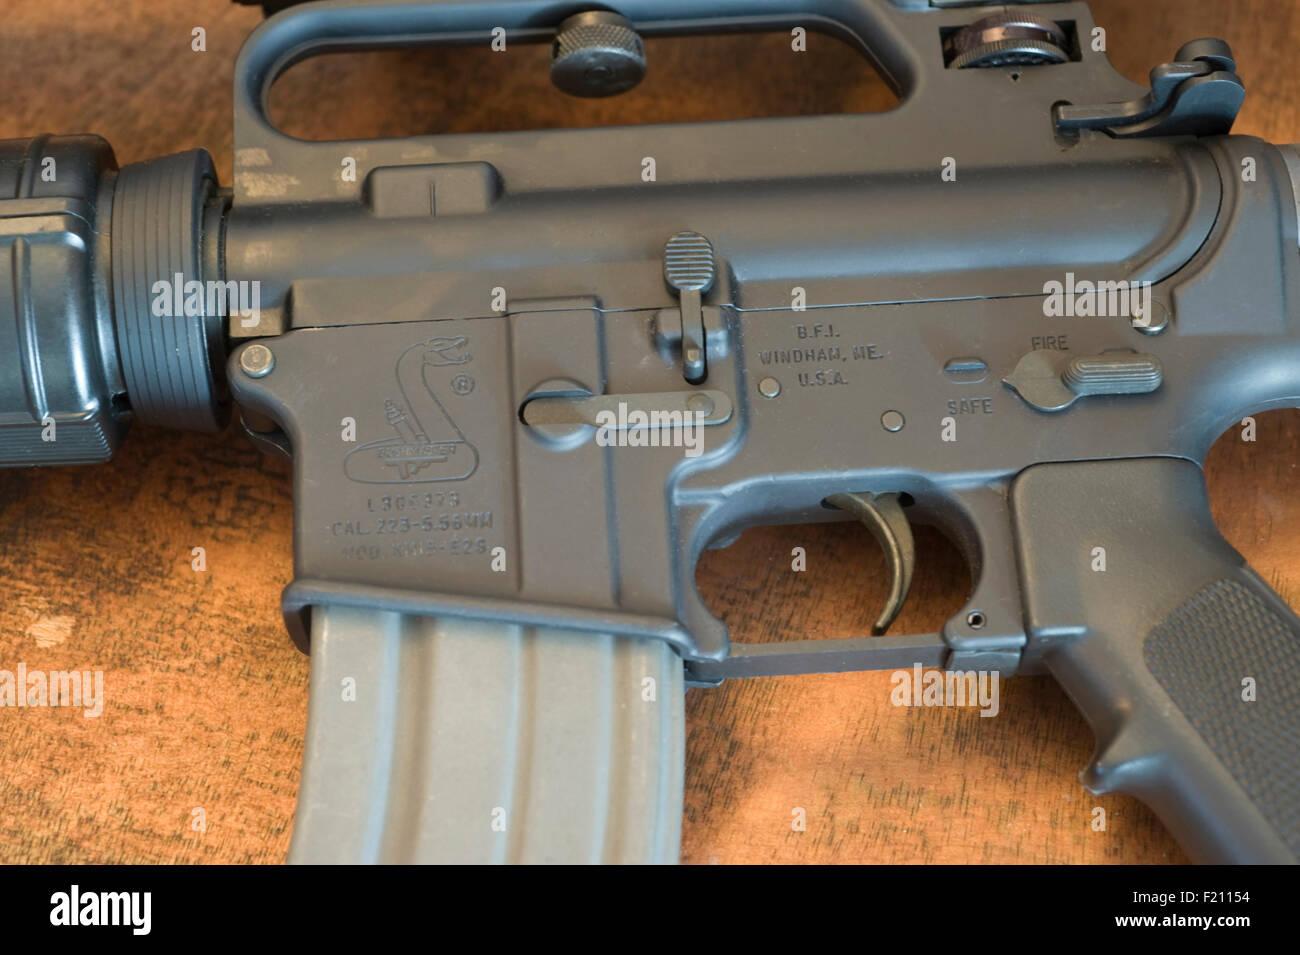 Bushmaster AR-15 assault rifle with 30 round 5 56mm magazine